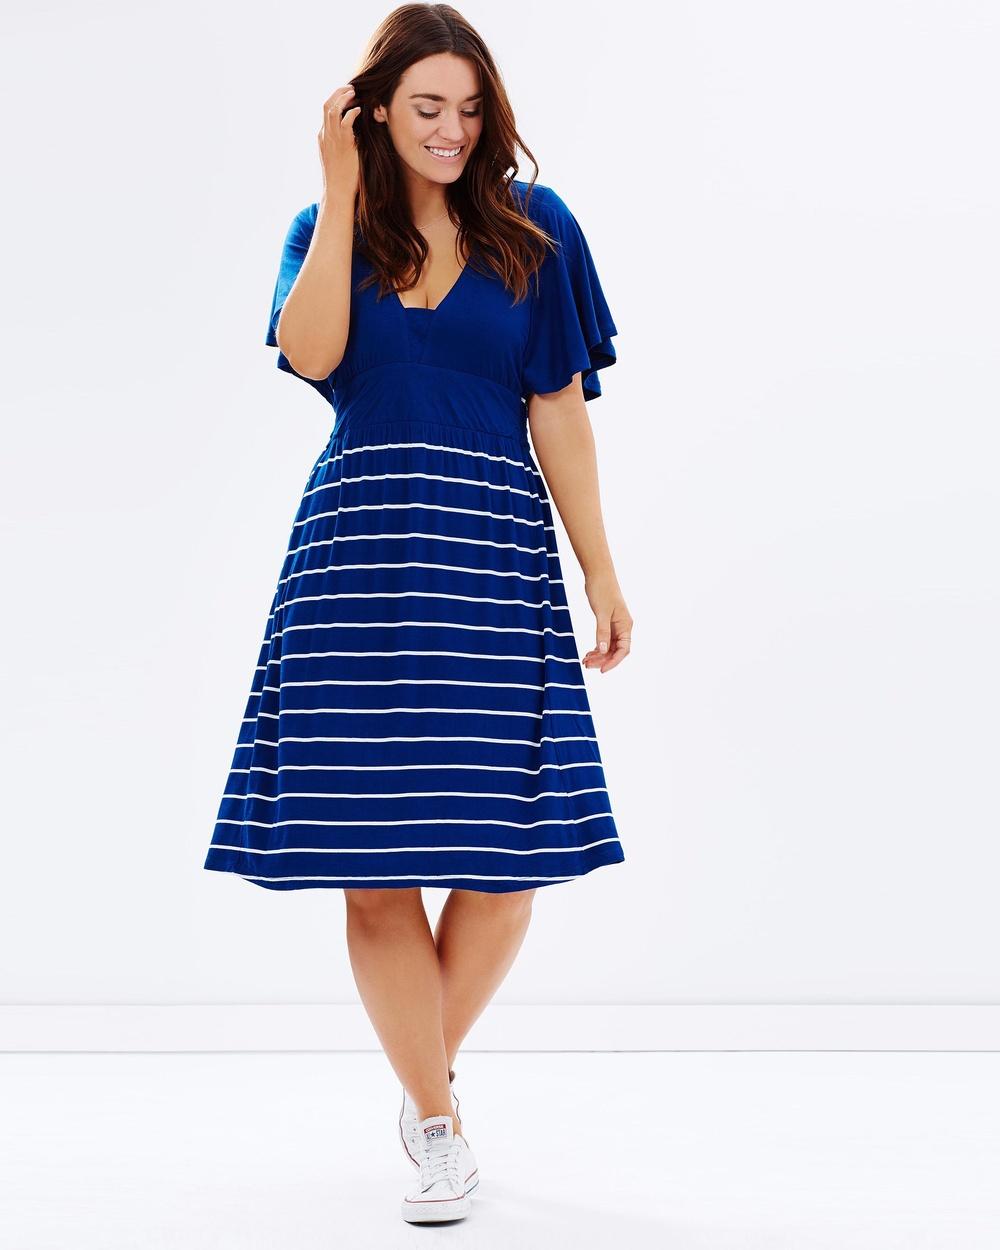 Basic Butterfly Sleeve Xxl Size Women Casual Dress Wholesale Plus ...